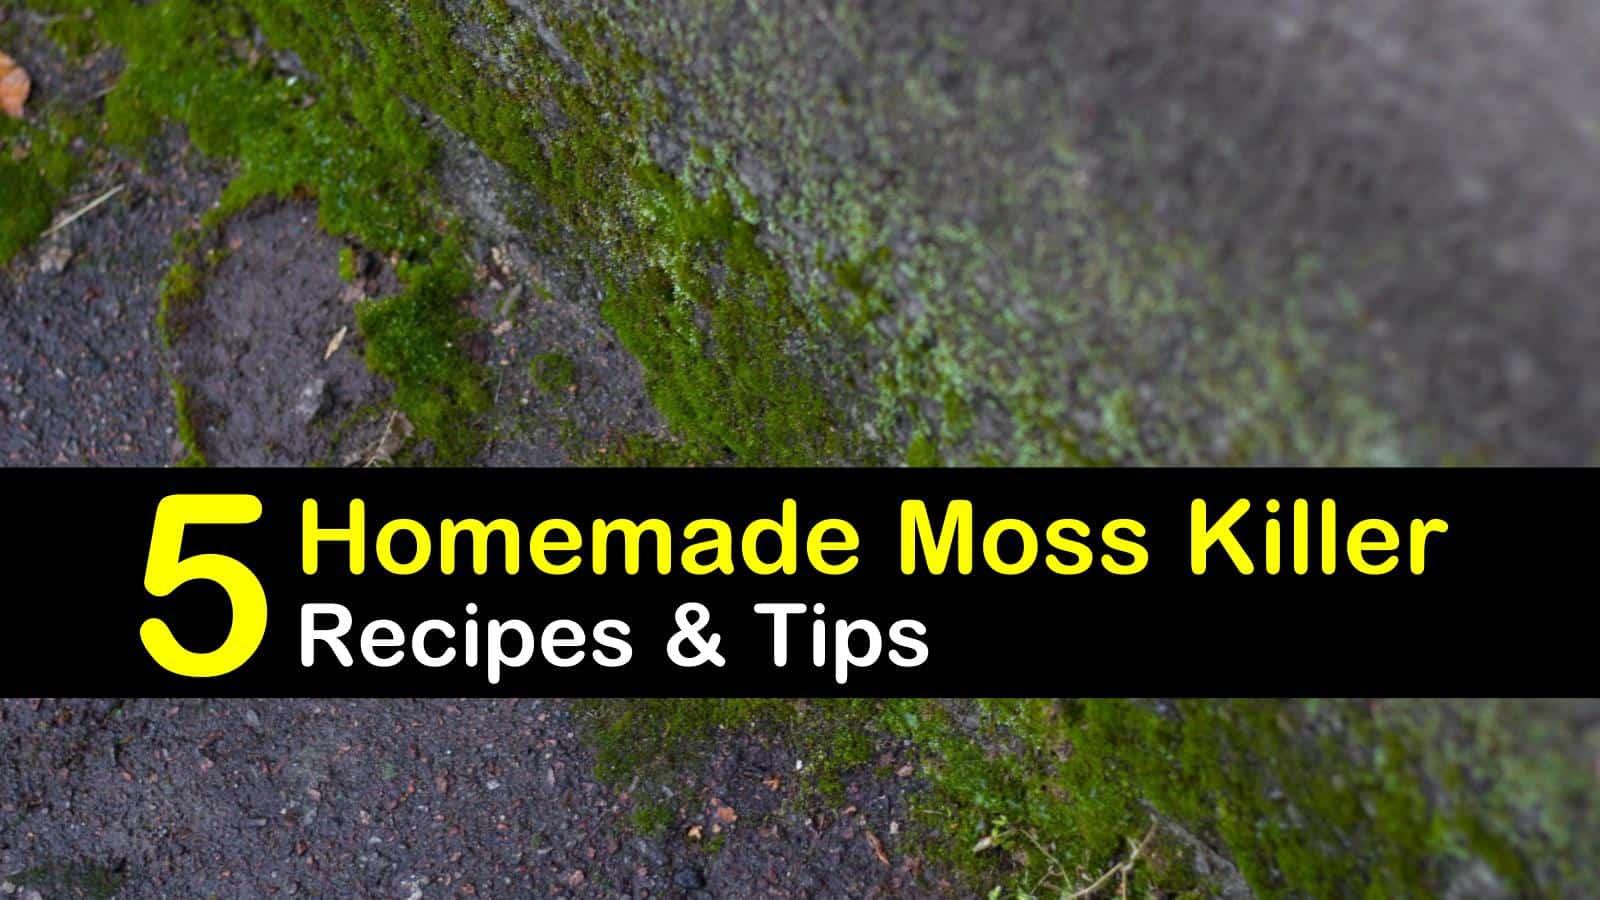 homemade moss killer recipes 5 natural